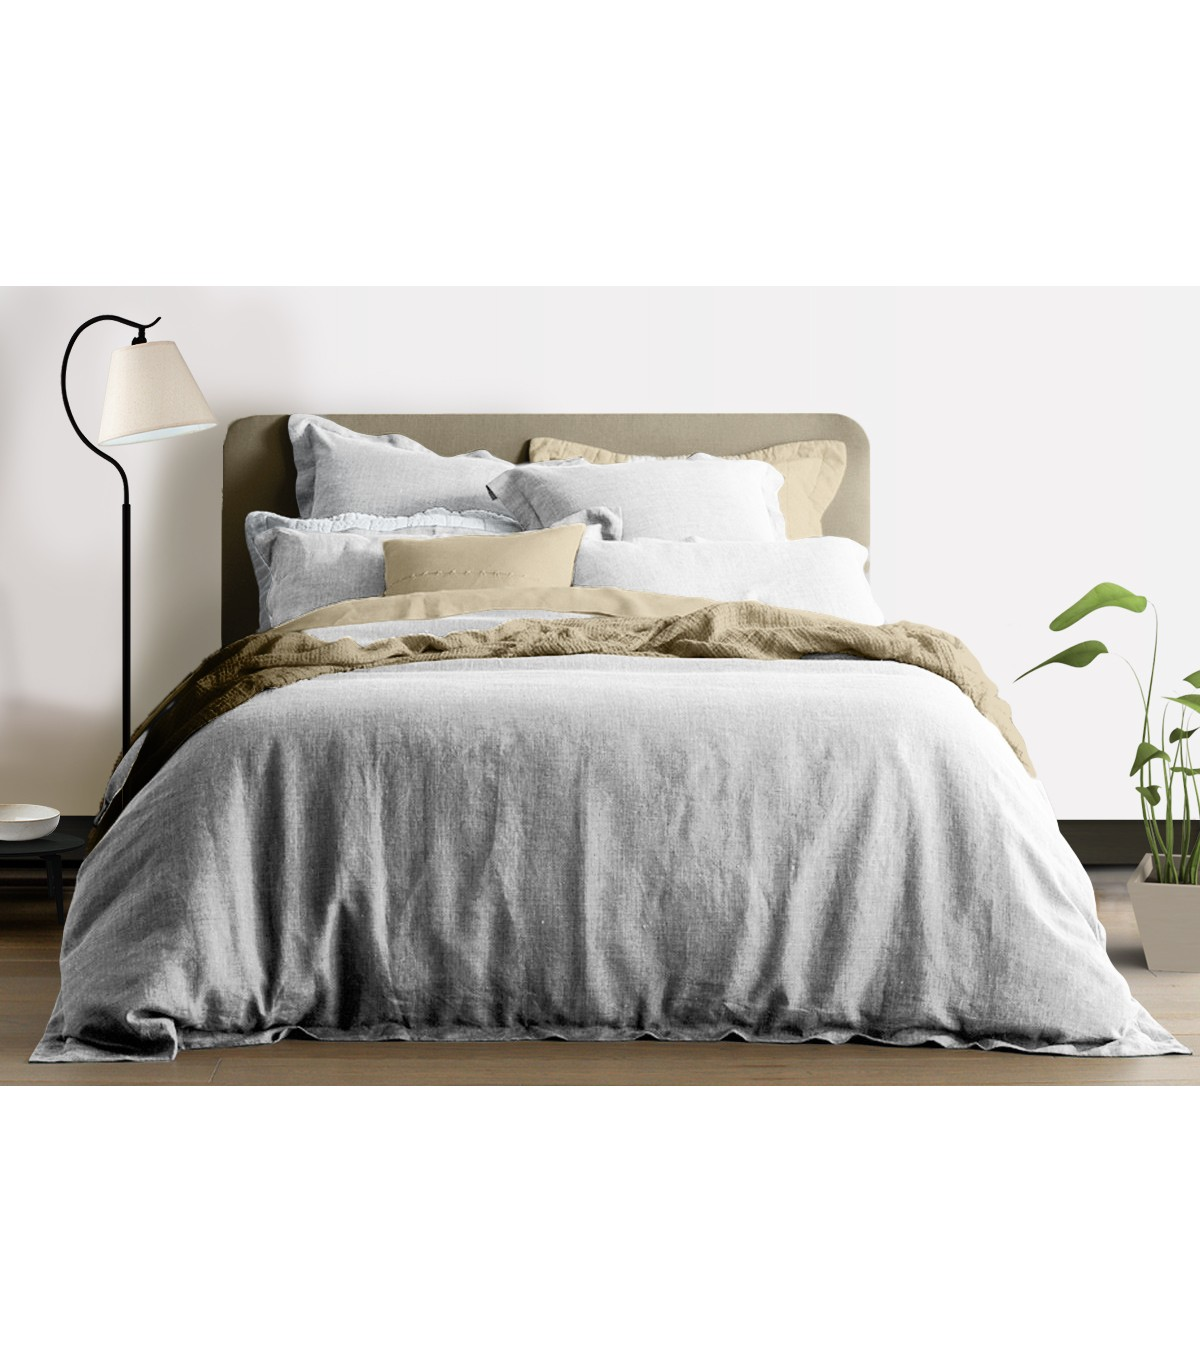 housse de couette 100 lin blanc my little bed. Black Bedroom Furniture Sets. Home Design Ideas